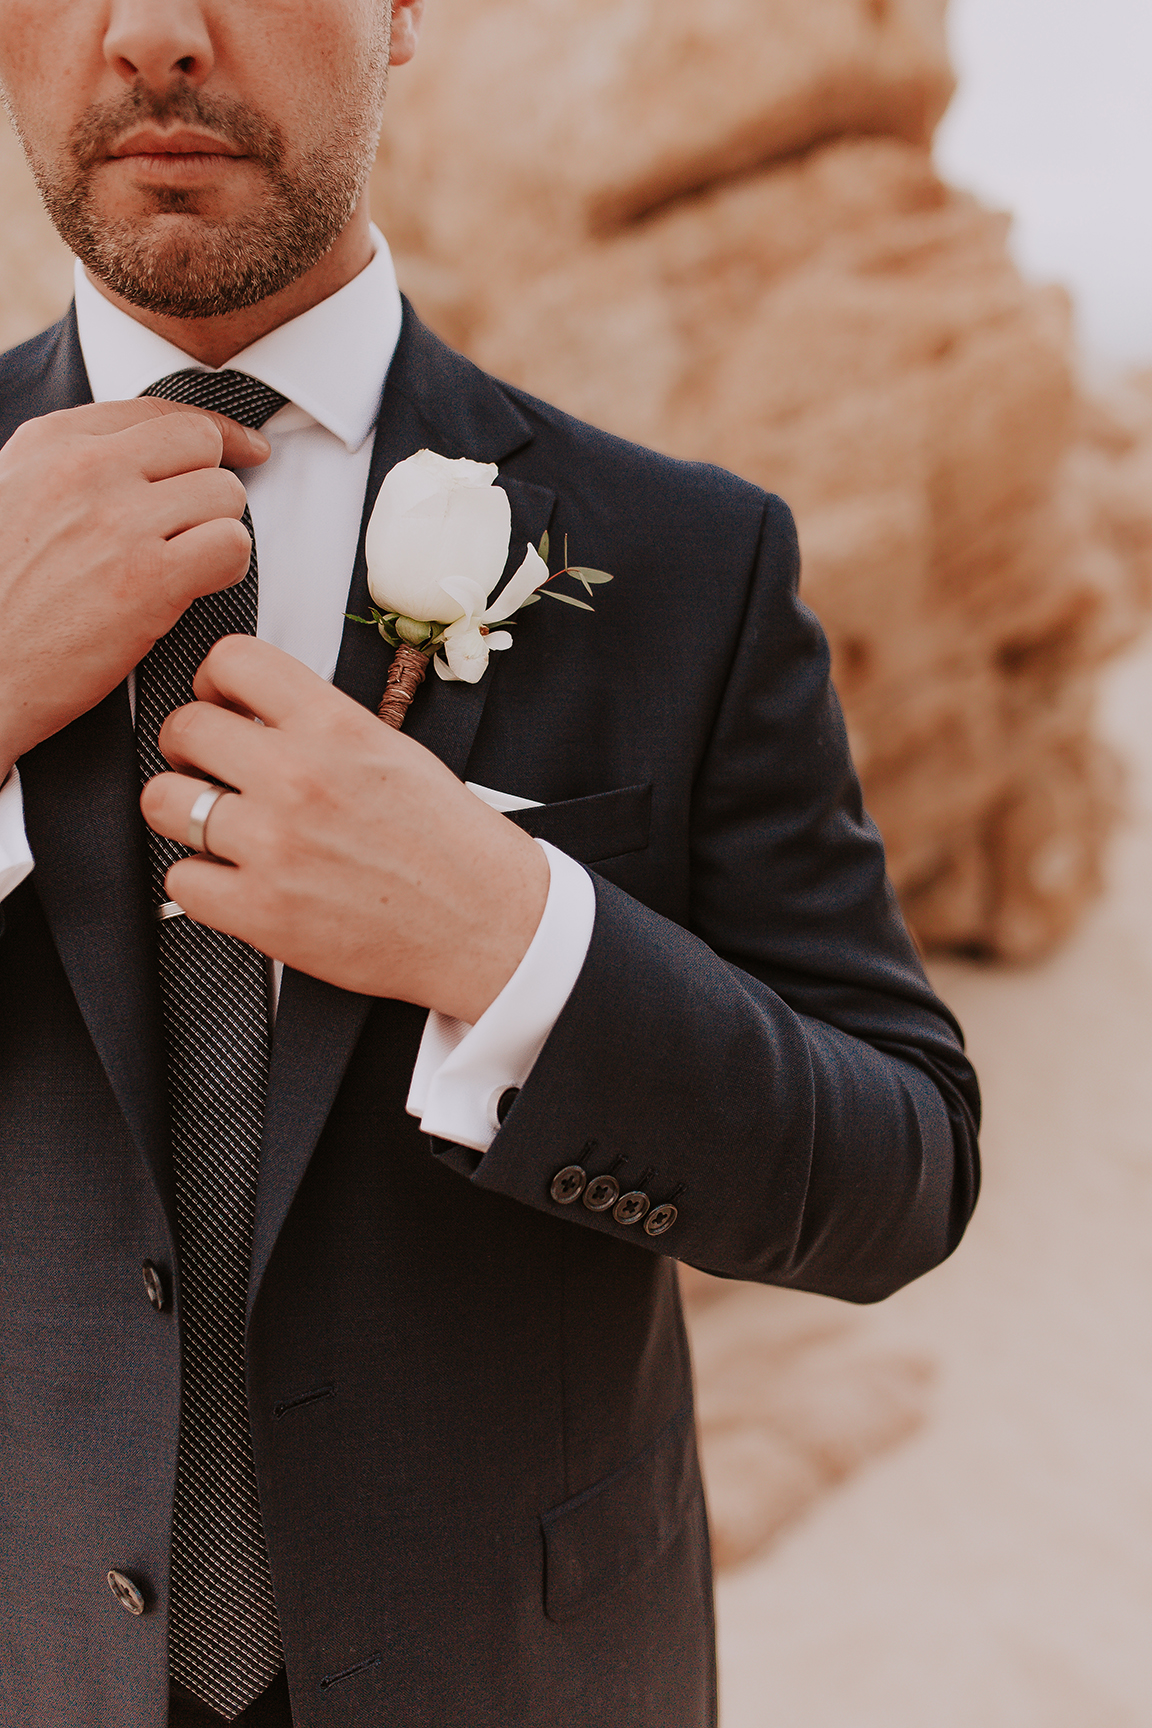 Lindsei+James_cabo_wedding_861.jpg